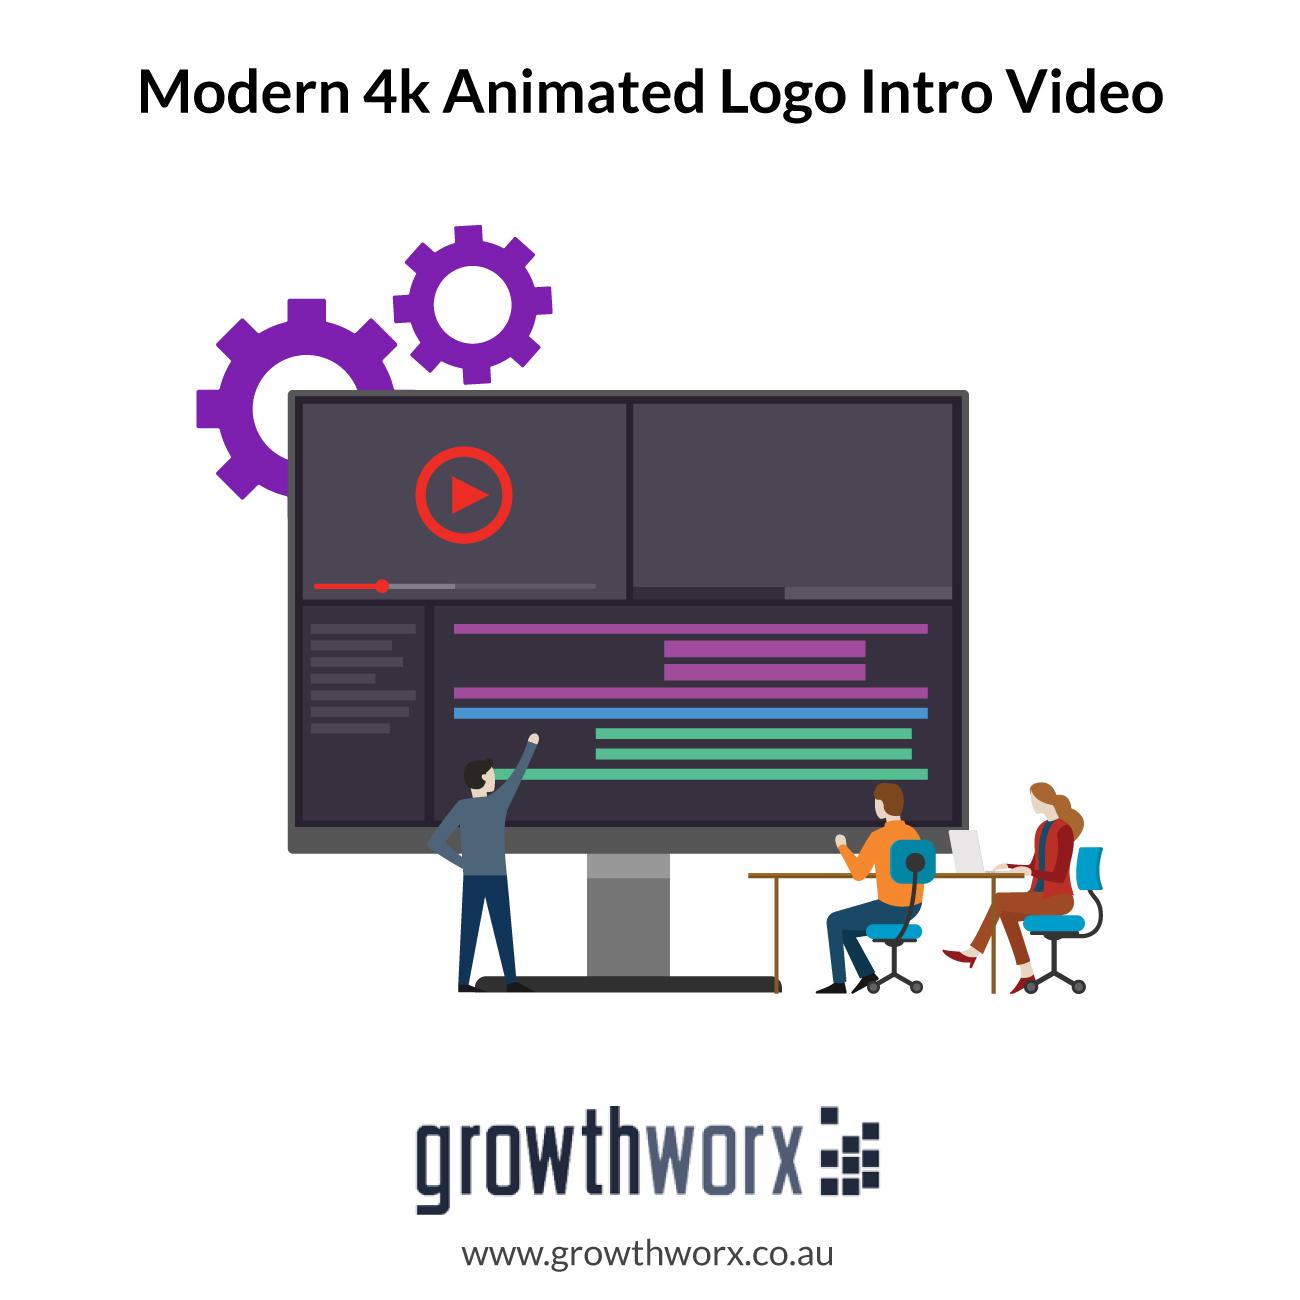 We will do modern 4k animated logo intro video 1